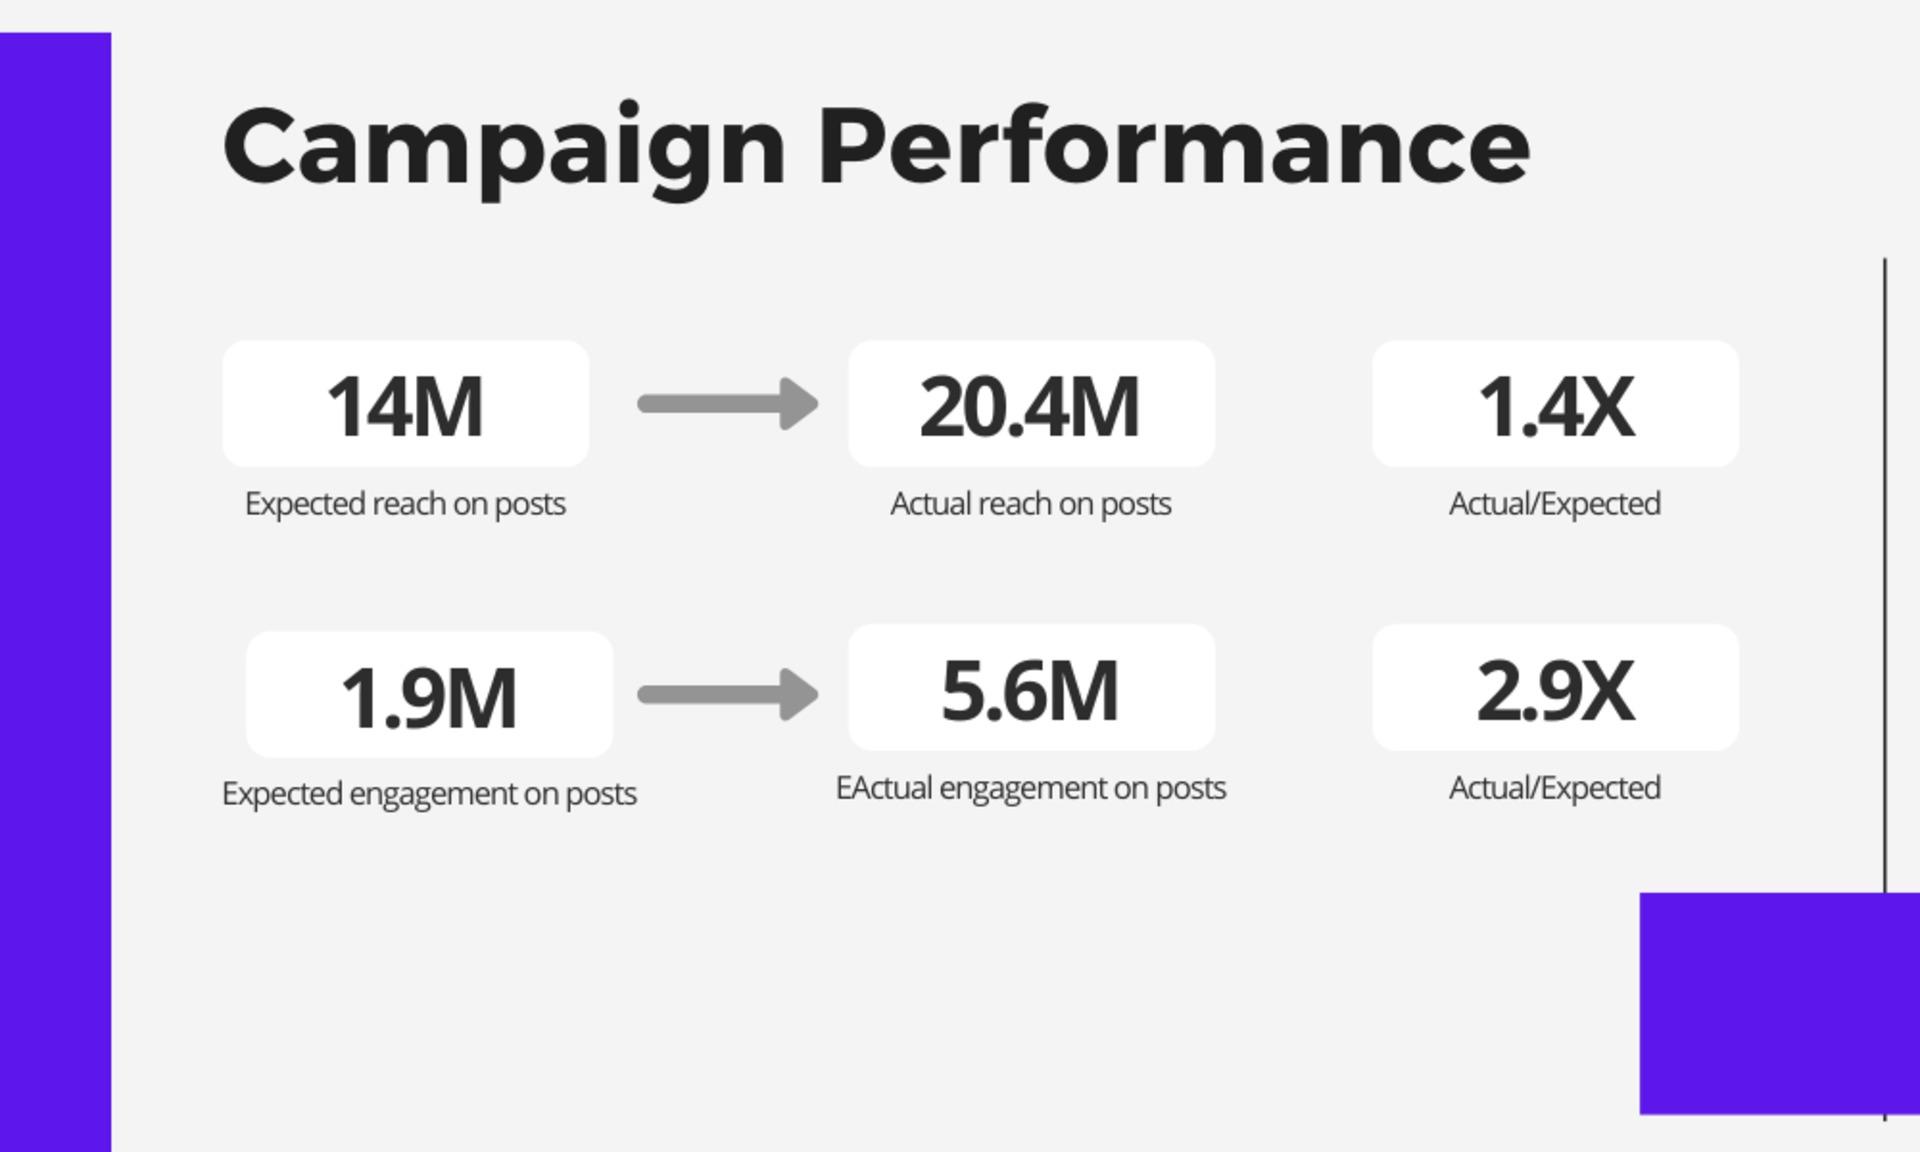 Winkl on Influencer Marketing - Paragon Case Study (1)